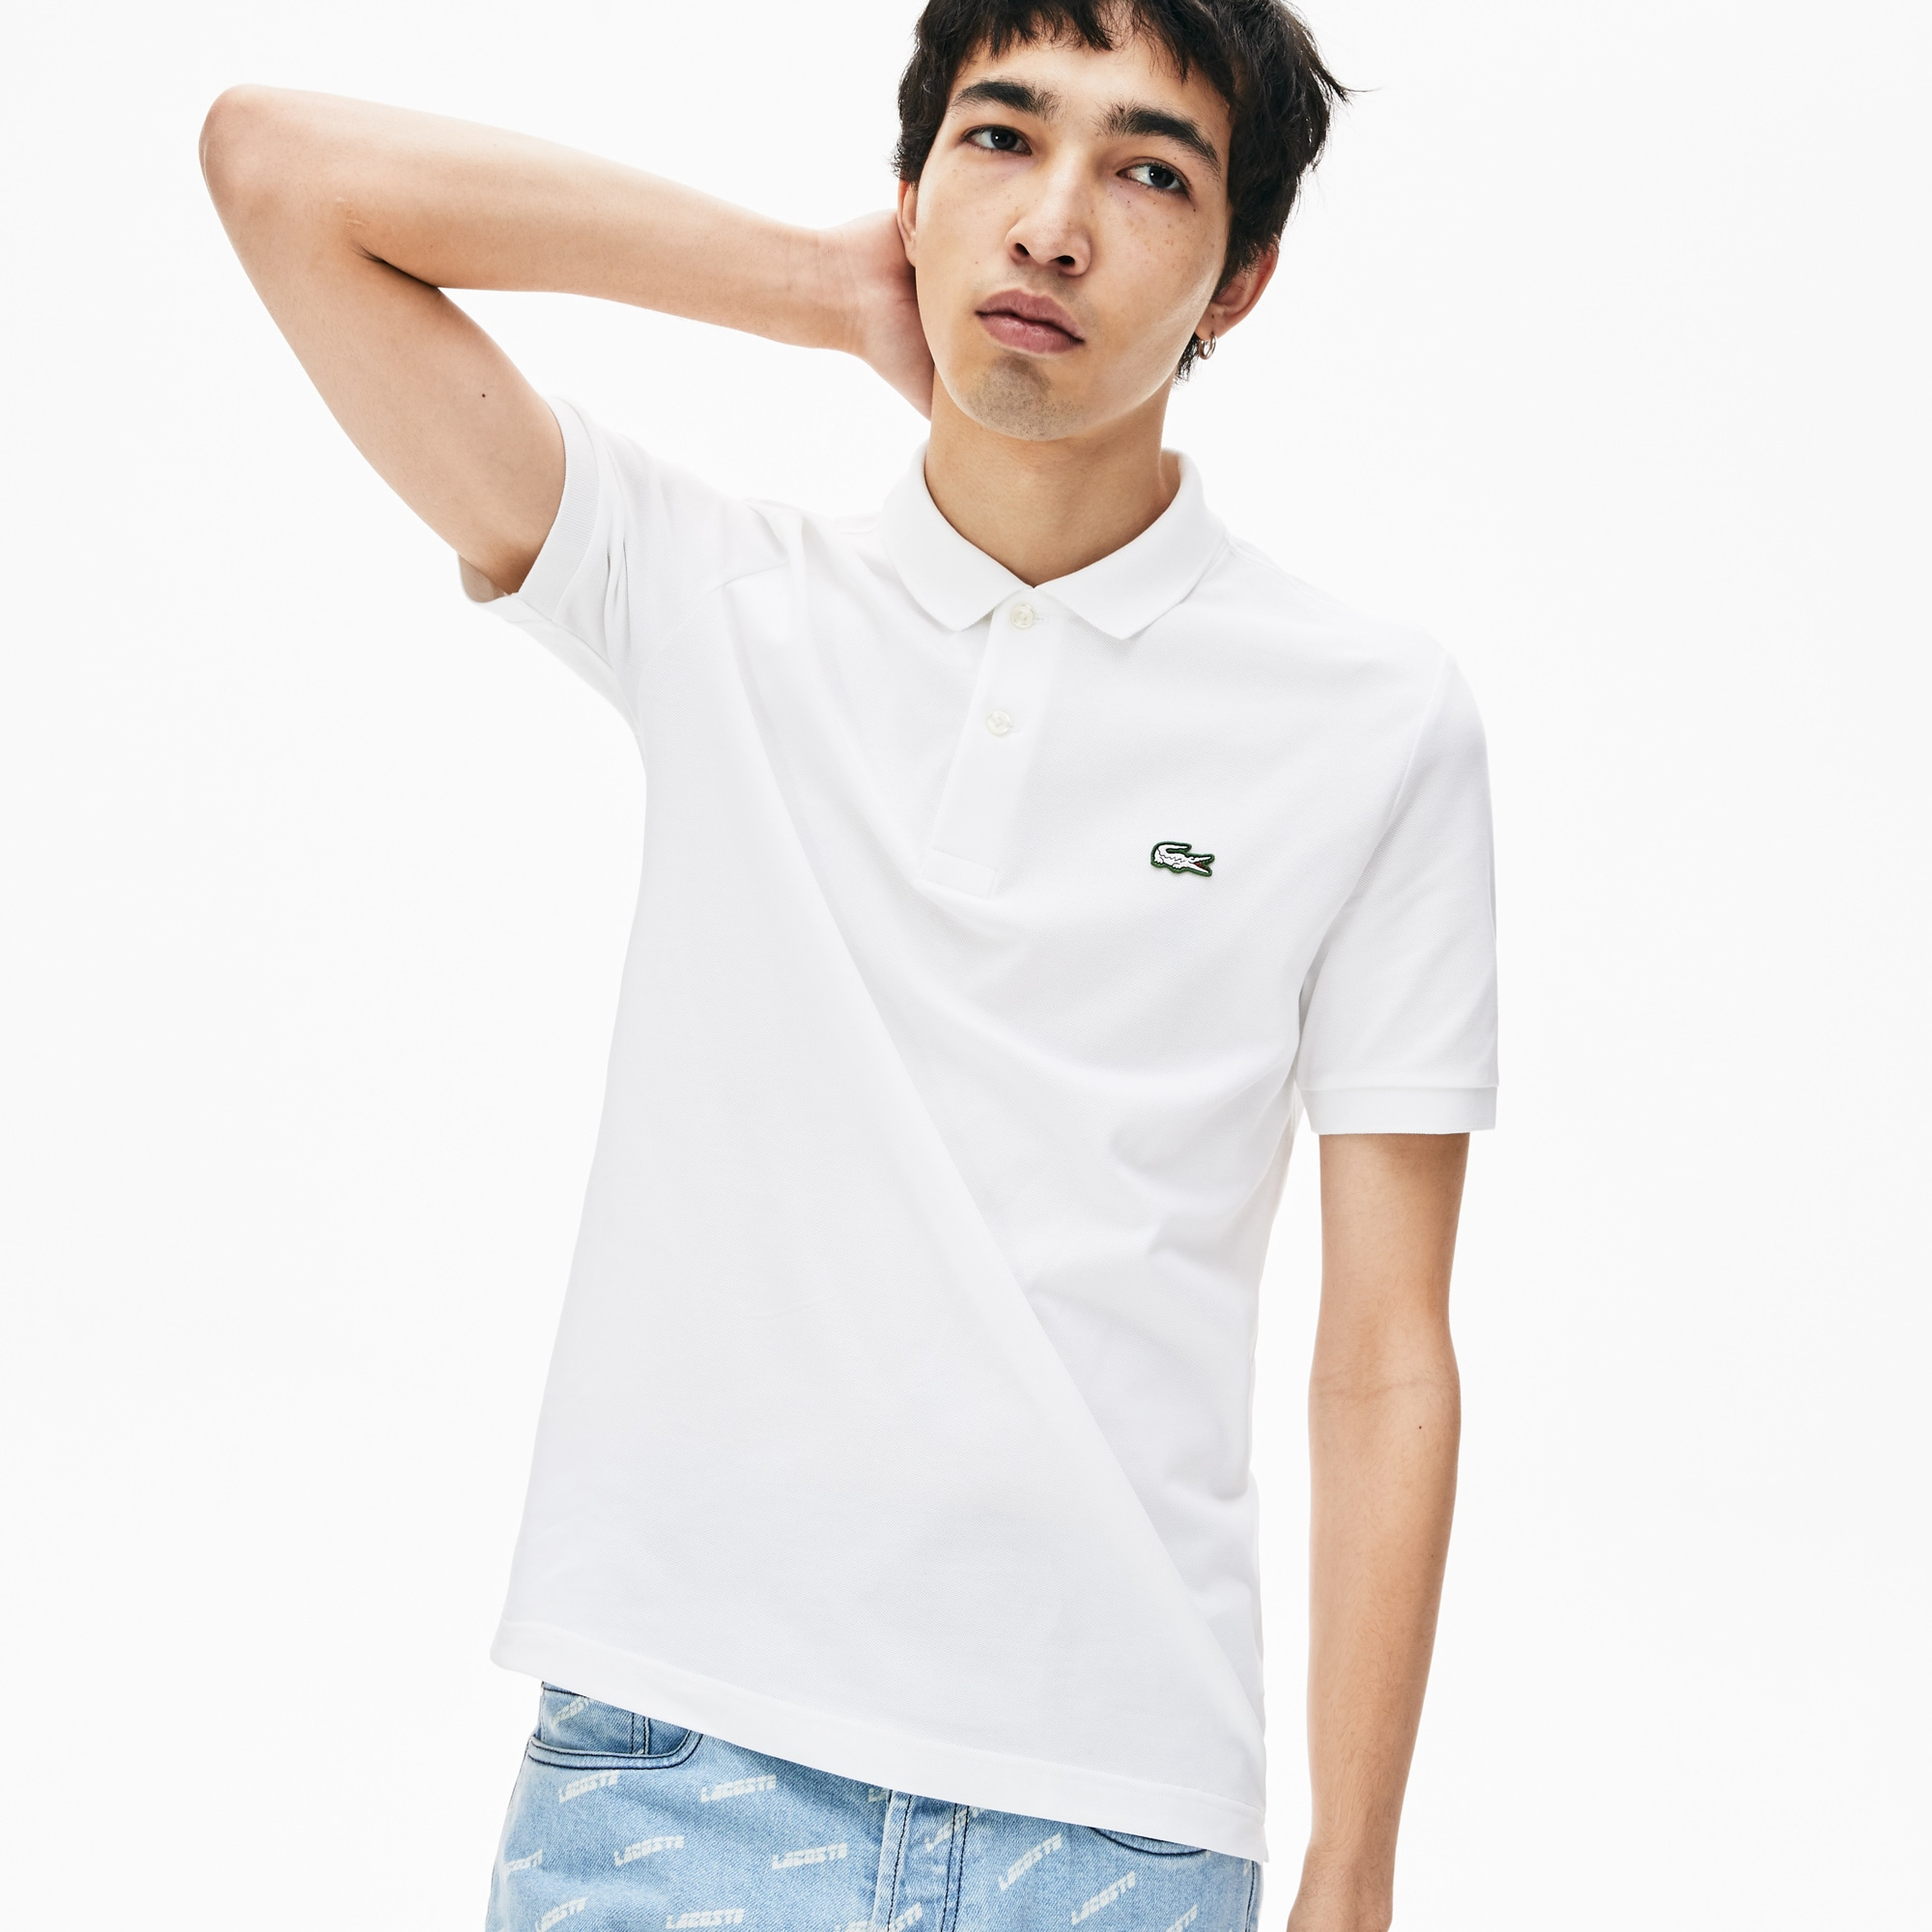 fa1293caee13 Men s polo shirts